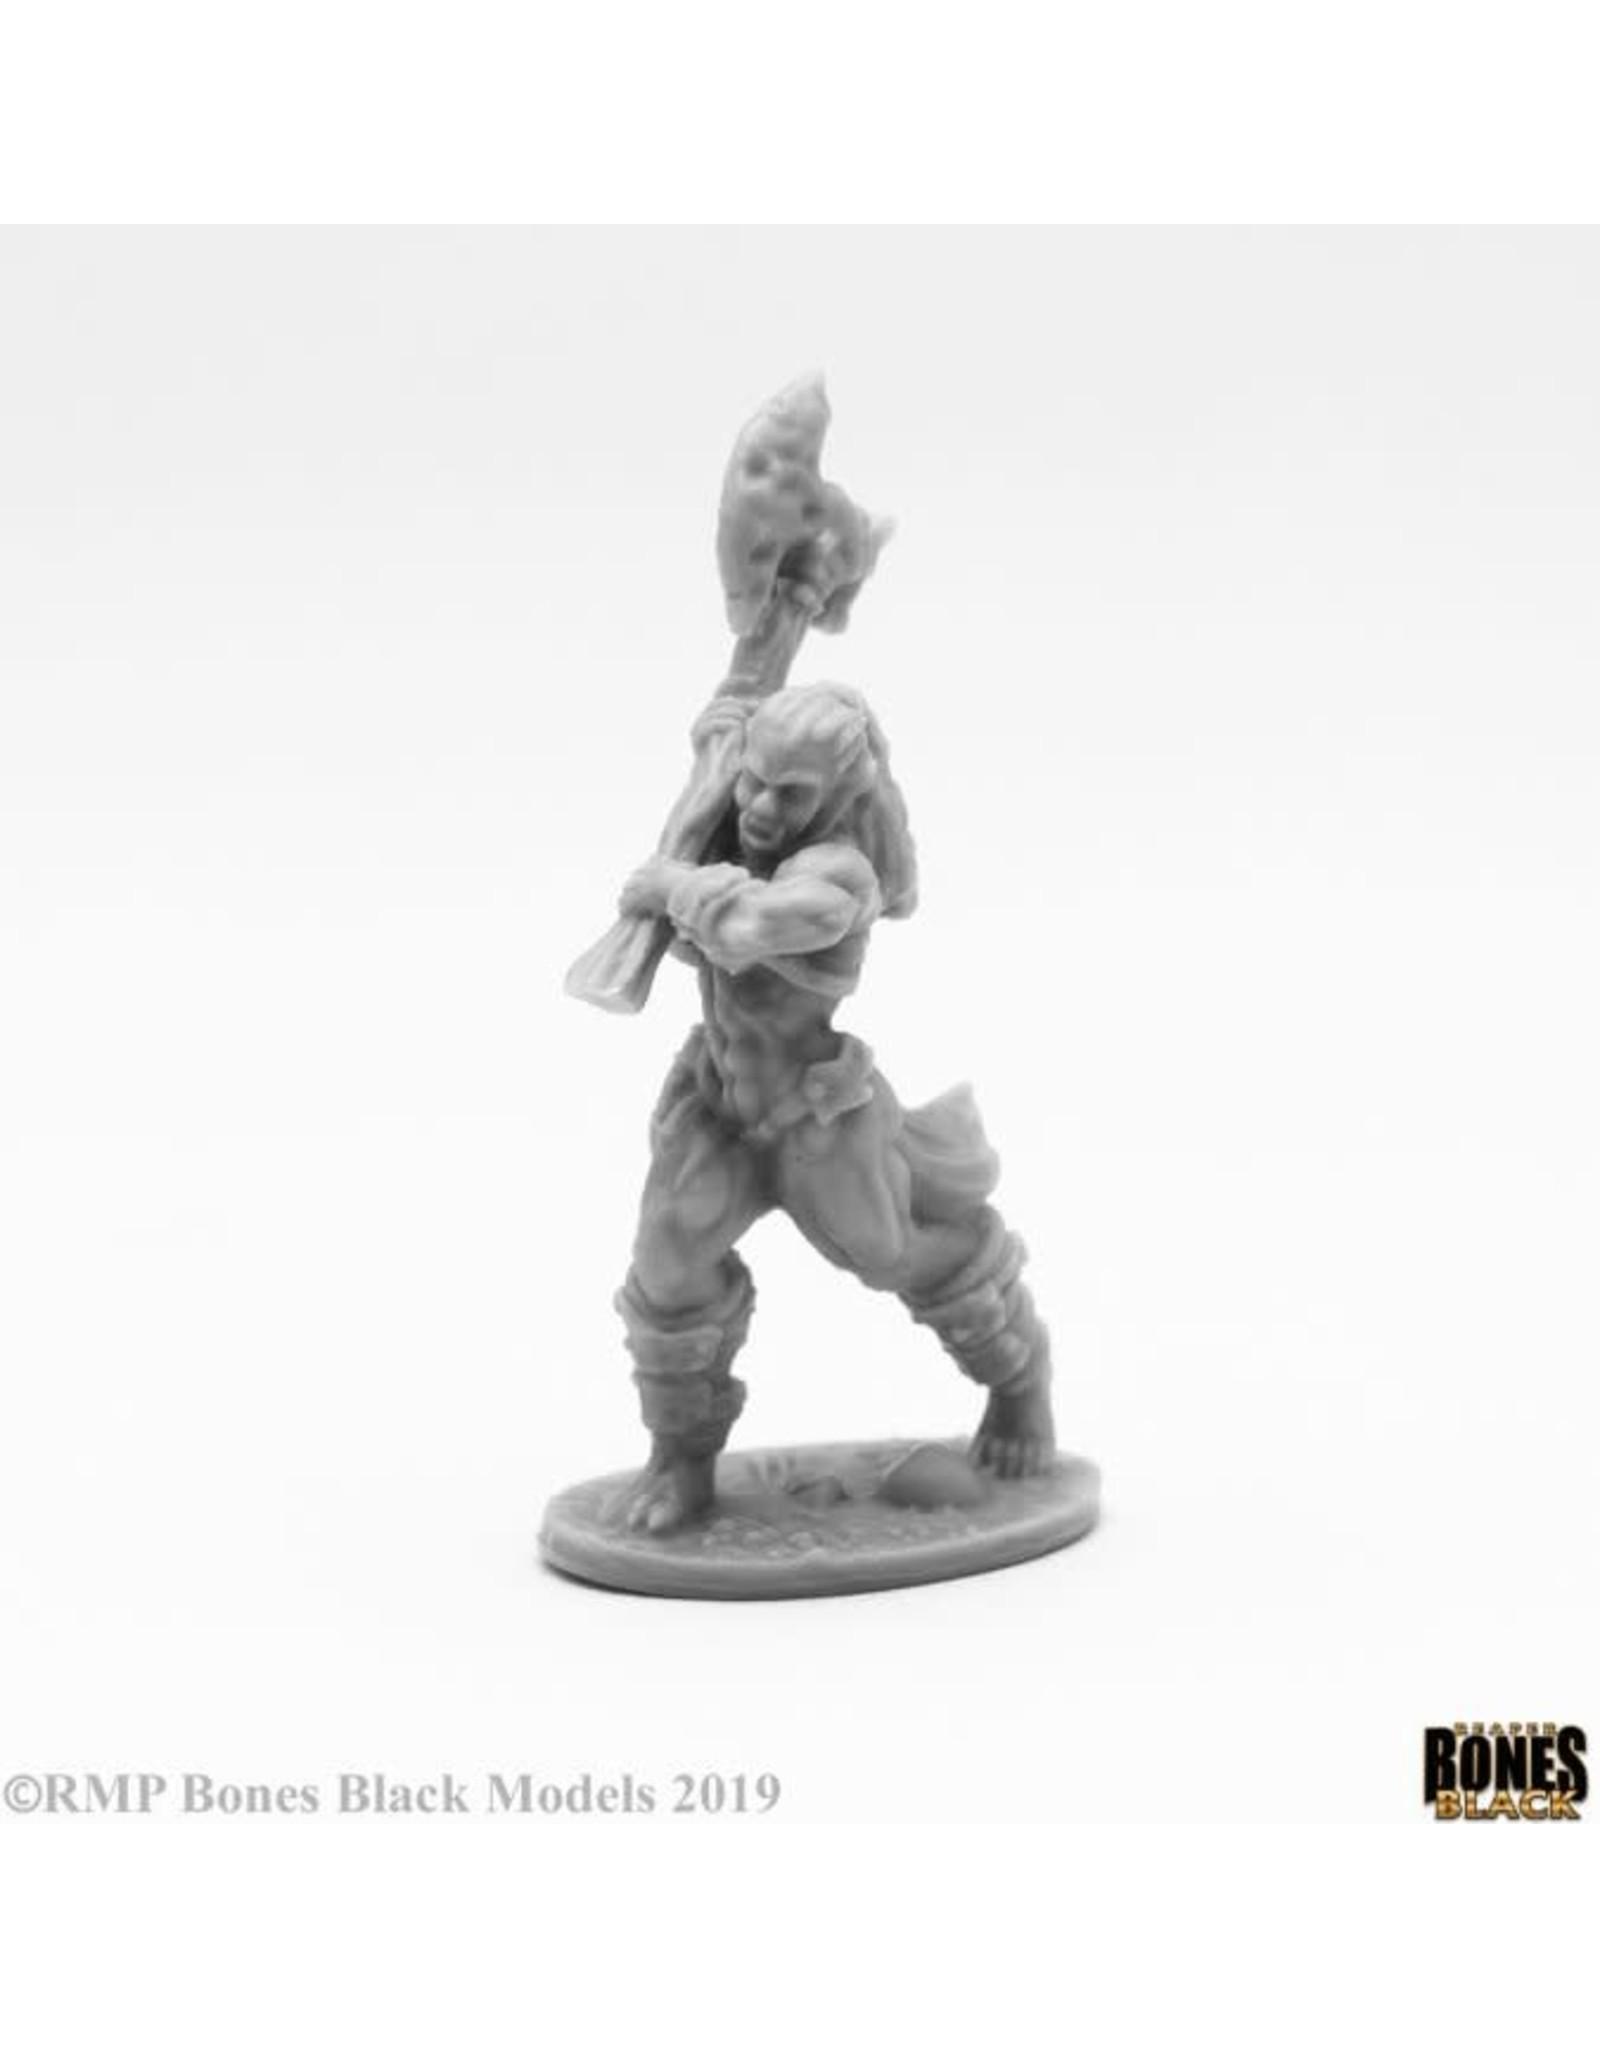 Reaper Reaper: Bones Black: Jade Fire Champion